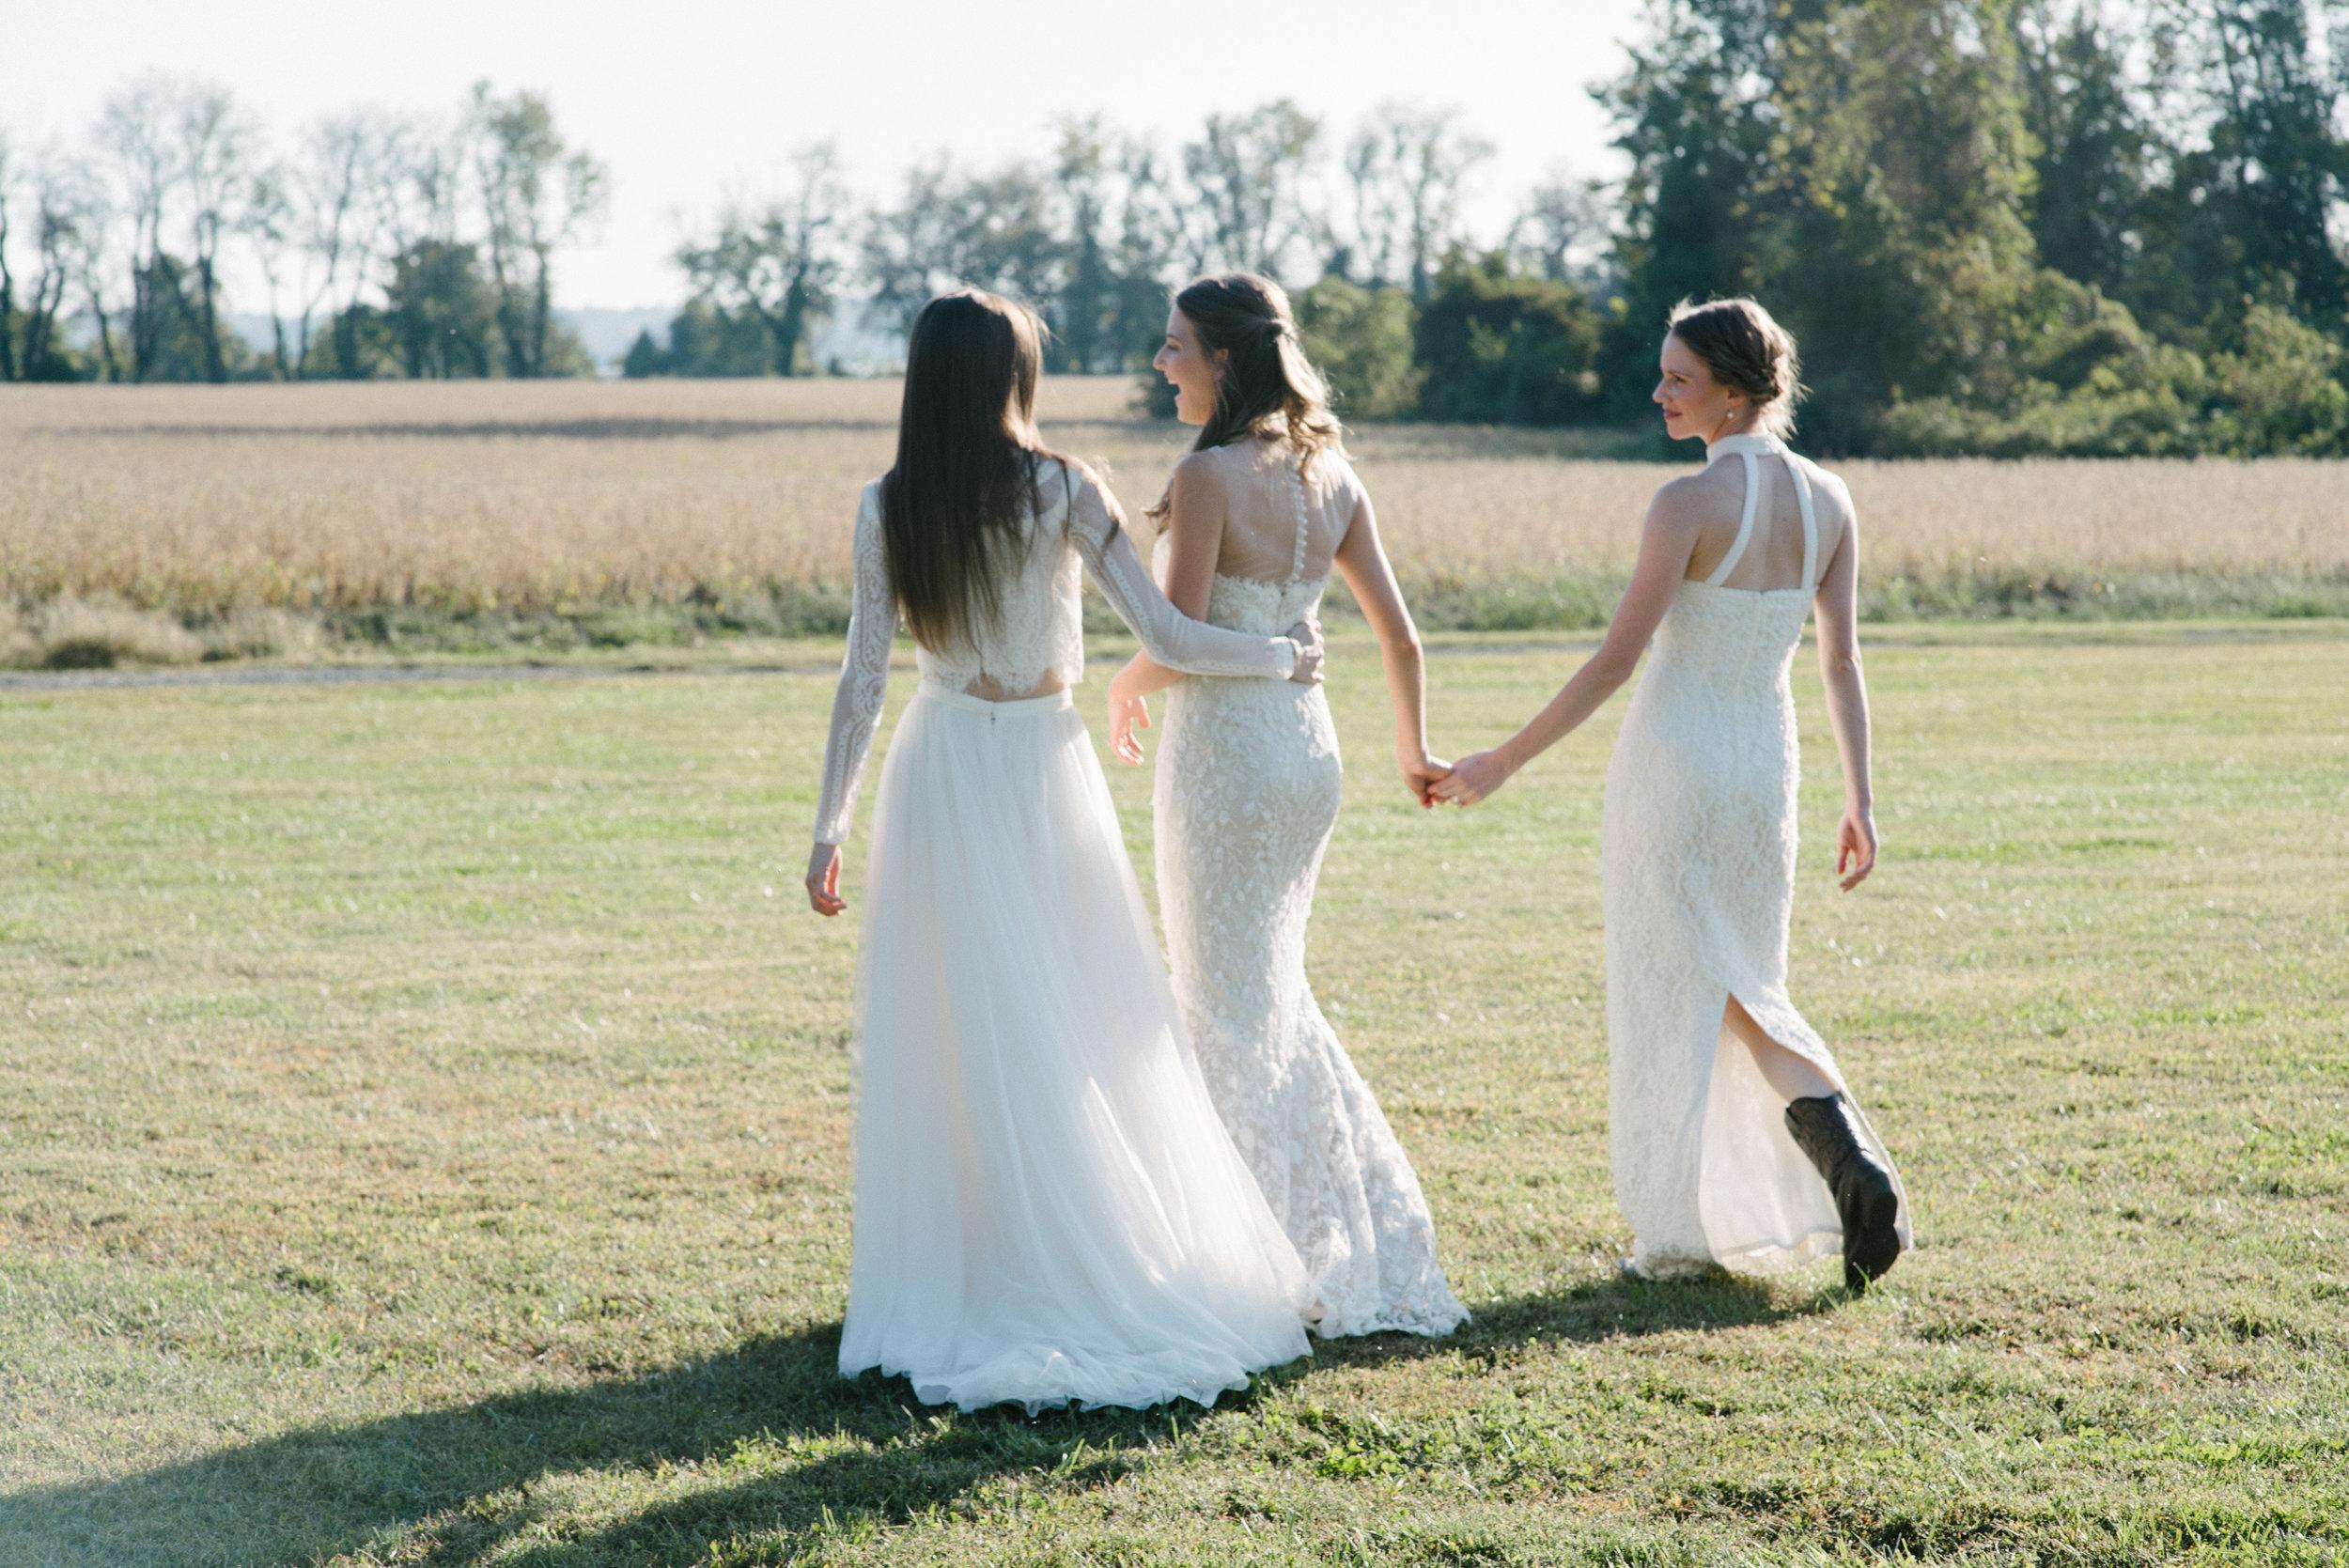 sister wedding dress photo shoot-41.jpg